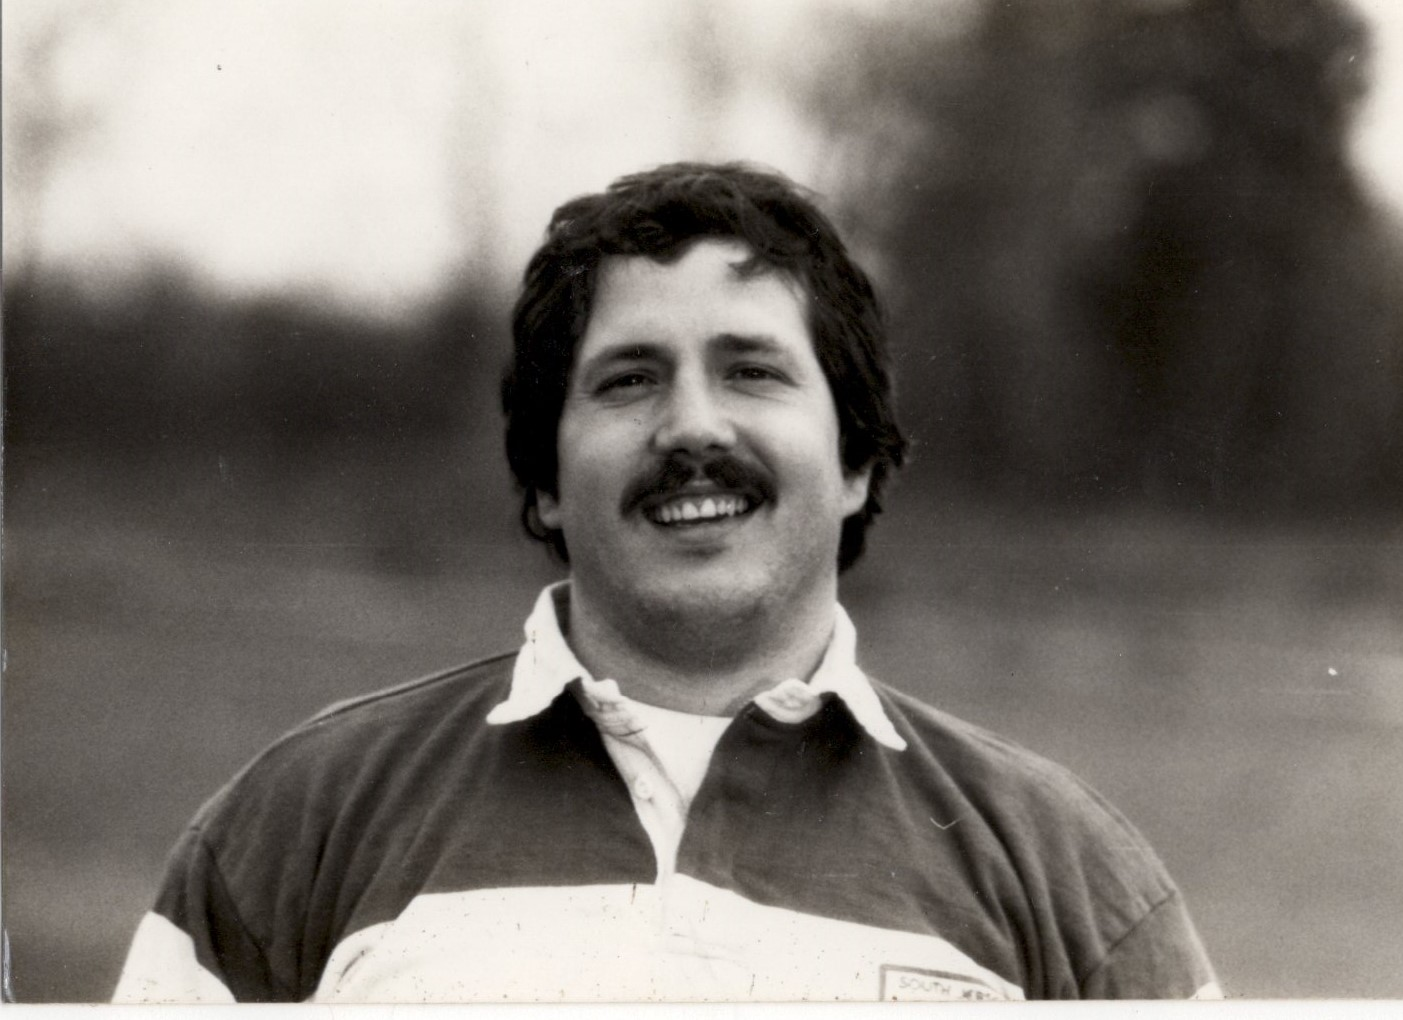 Curt Gruber - 2002